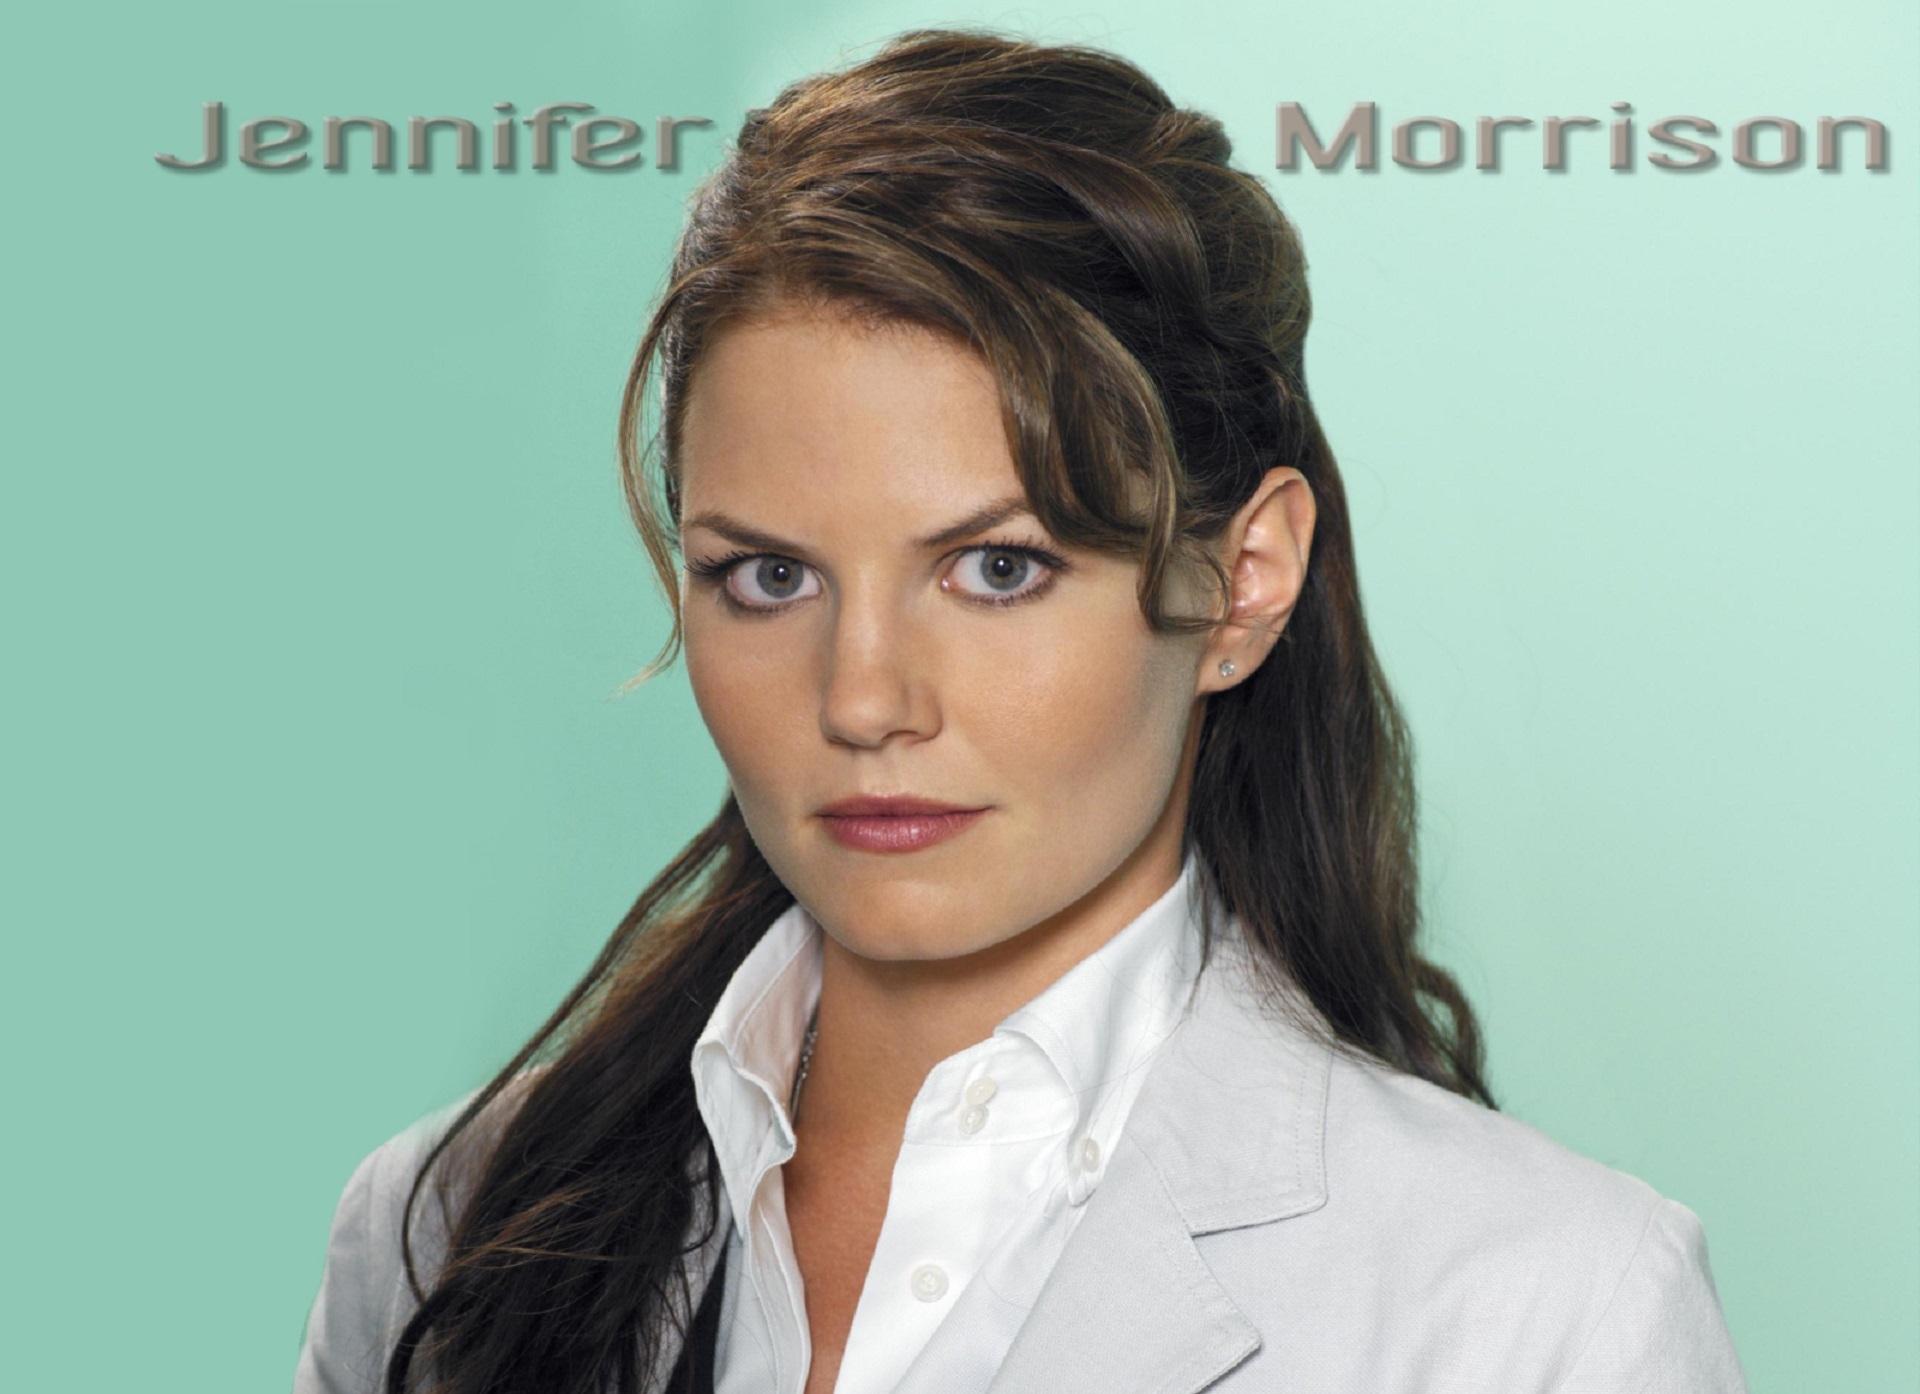 Jennifer Morrison Background